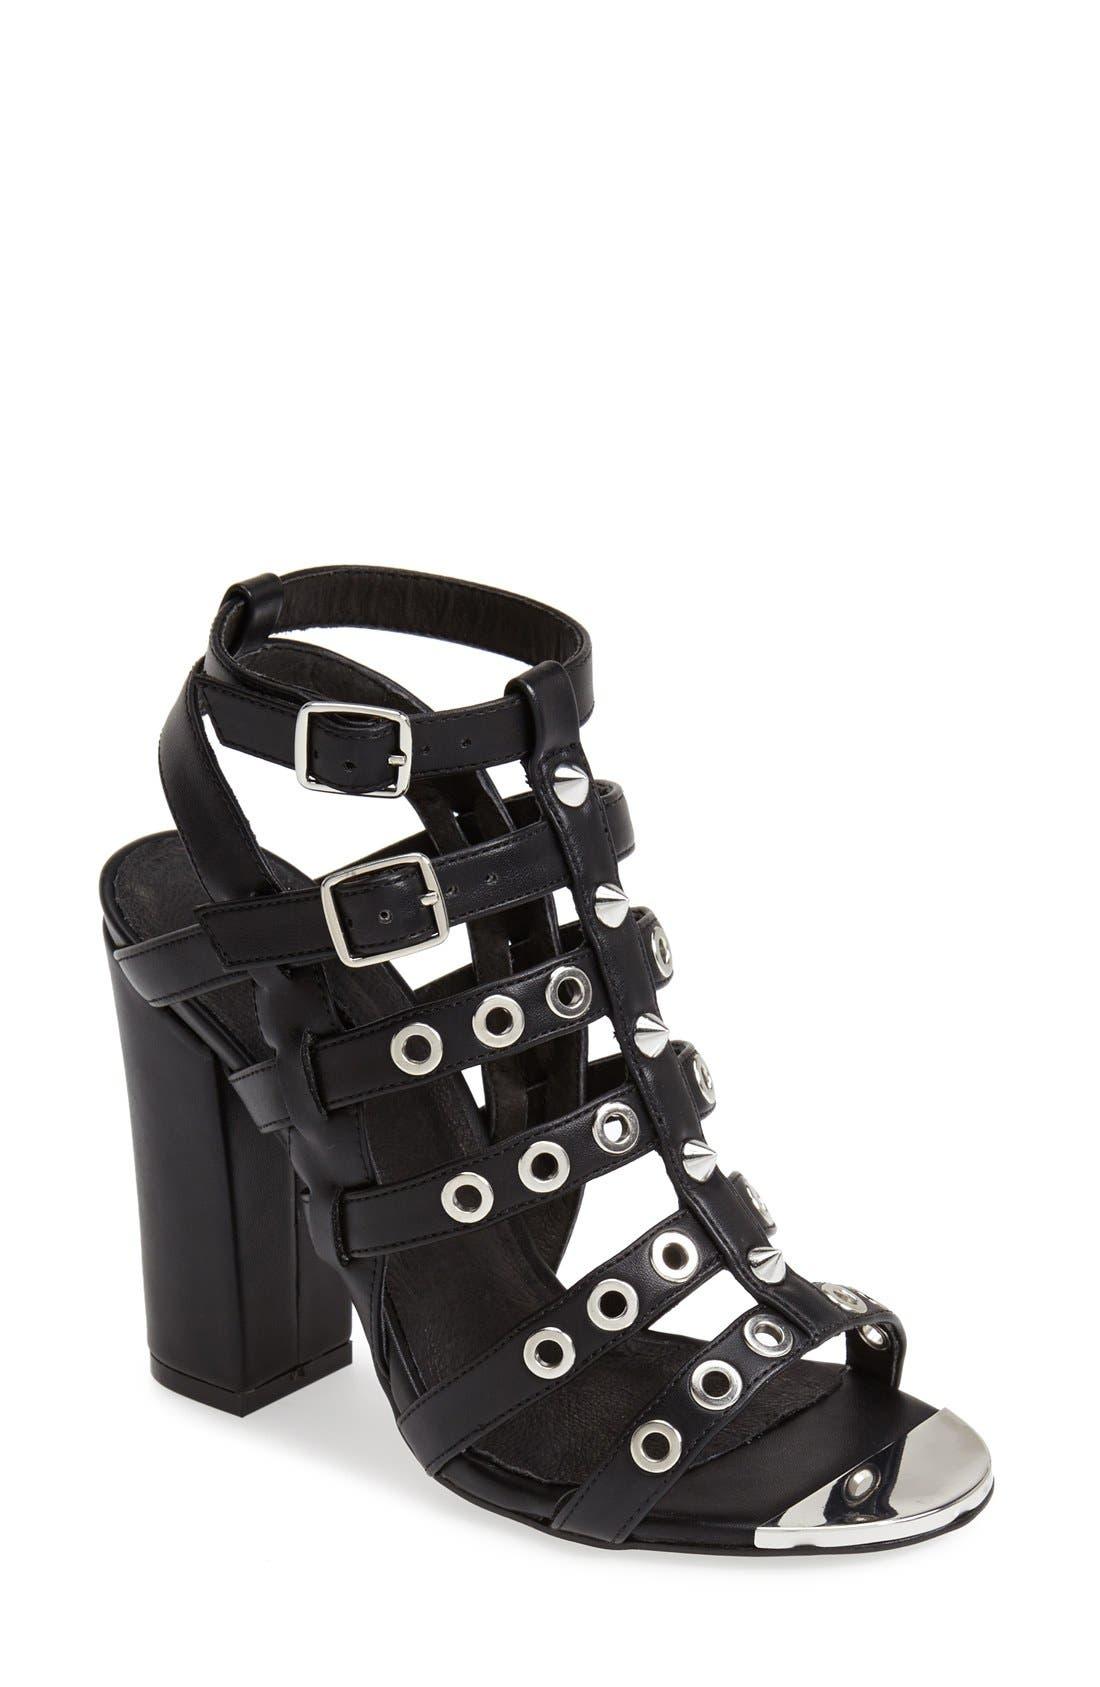 Main Image - Topshop 'Roxy' Gladiator Sandal (Women)